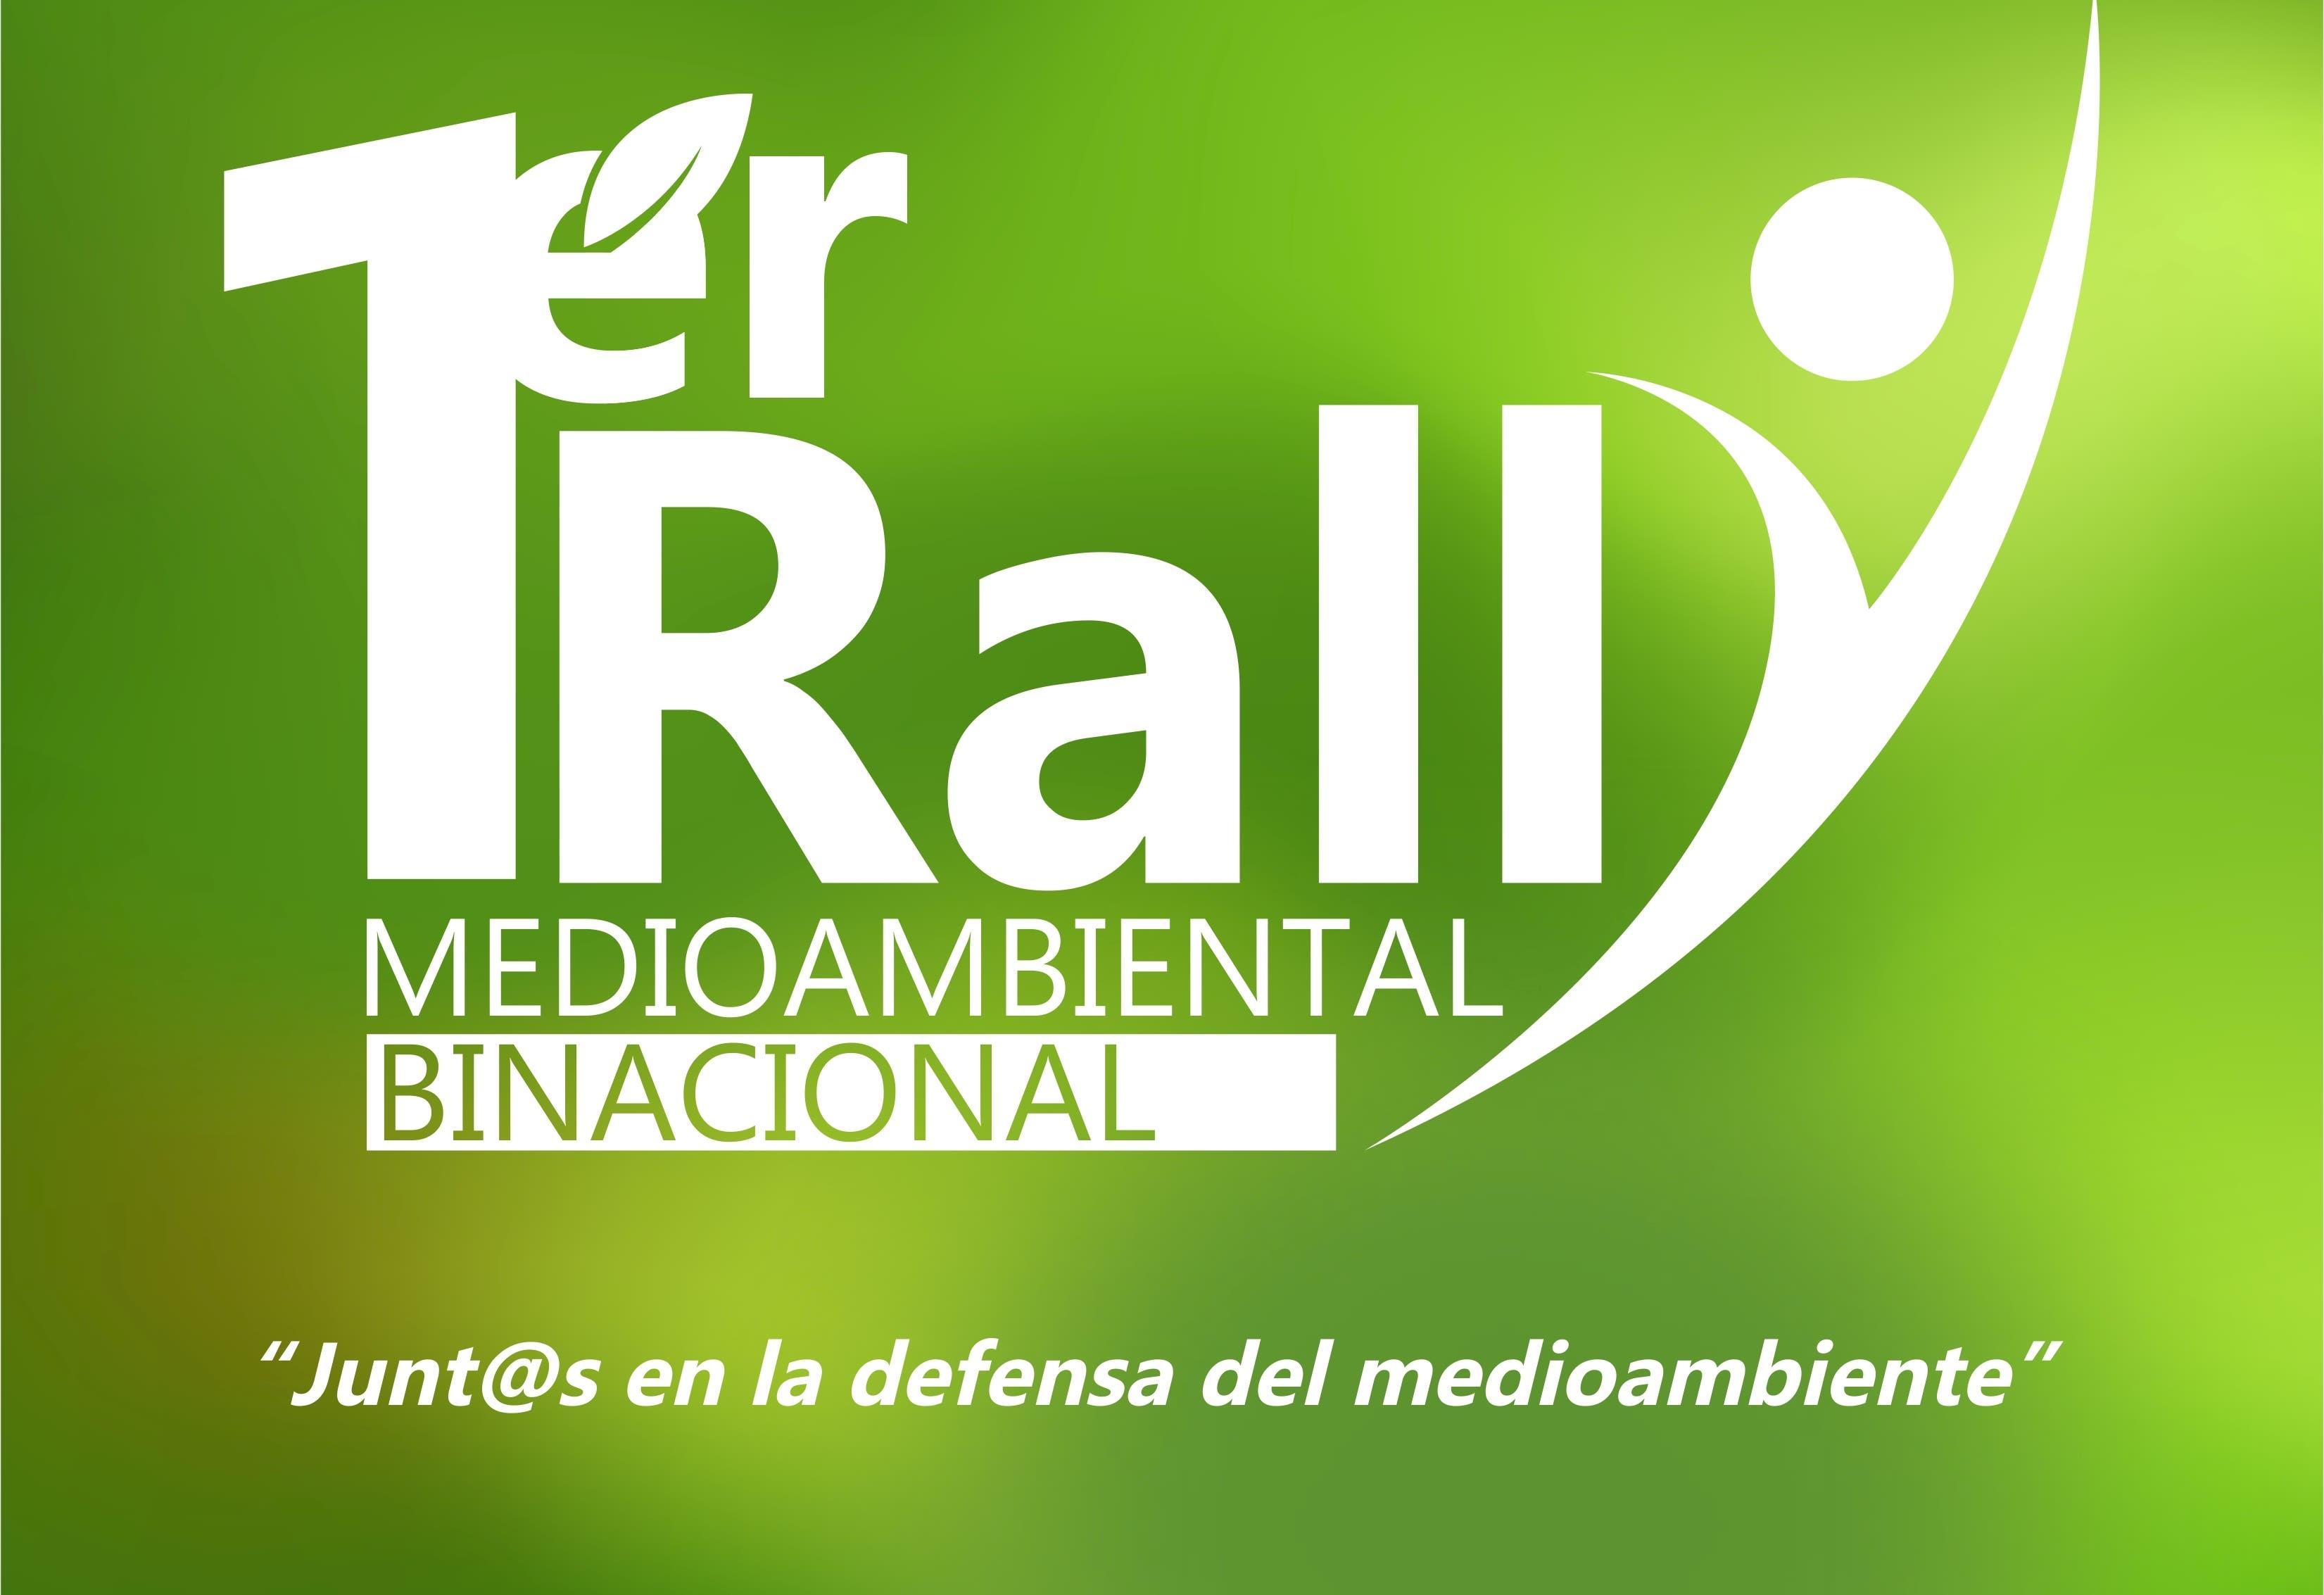 AFICHE RALLY MEDIOAMBIENTAL Marzo